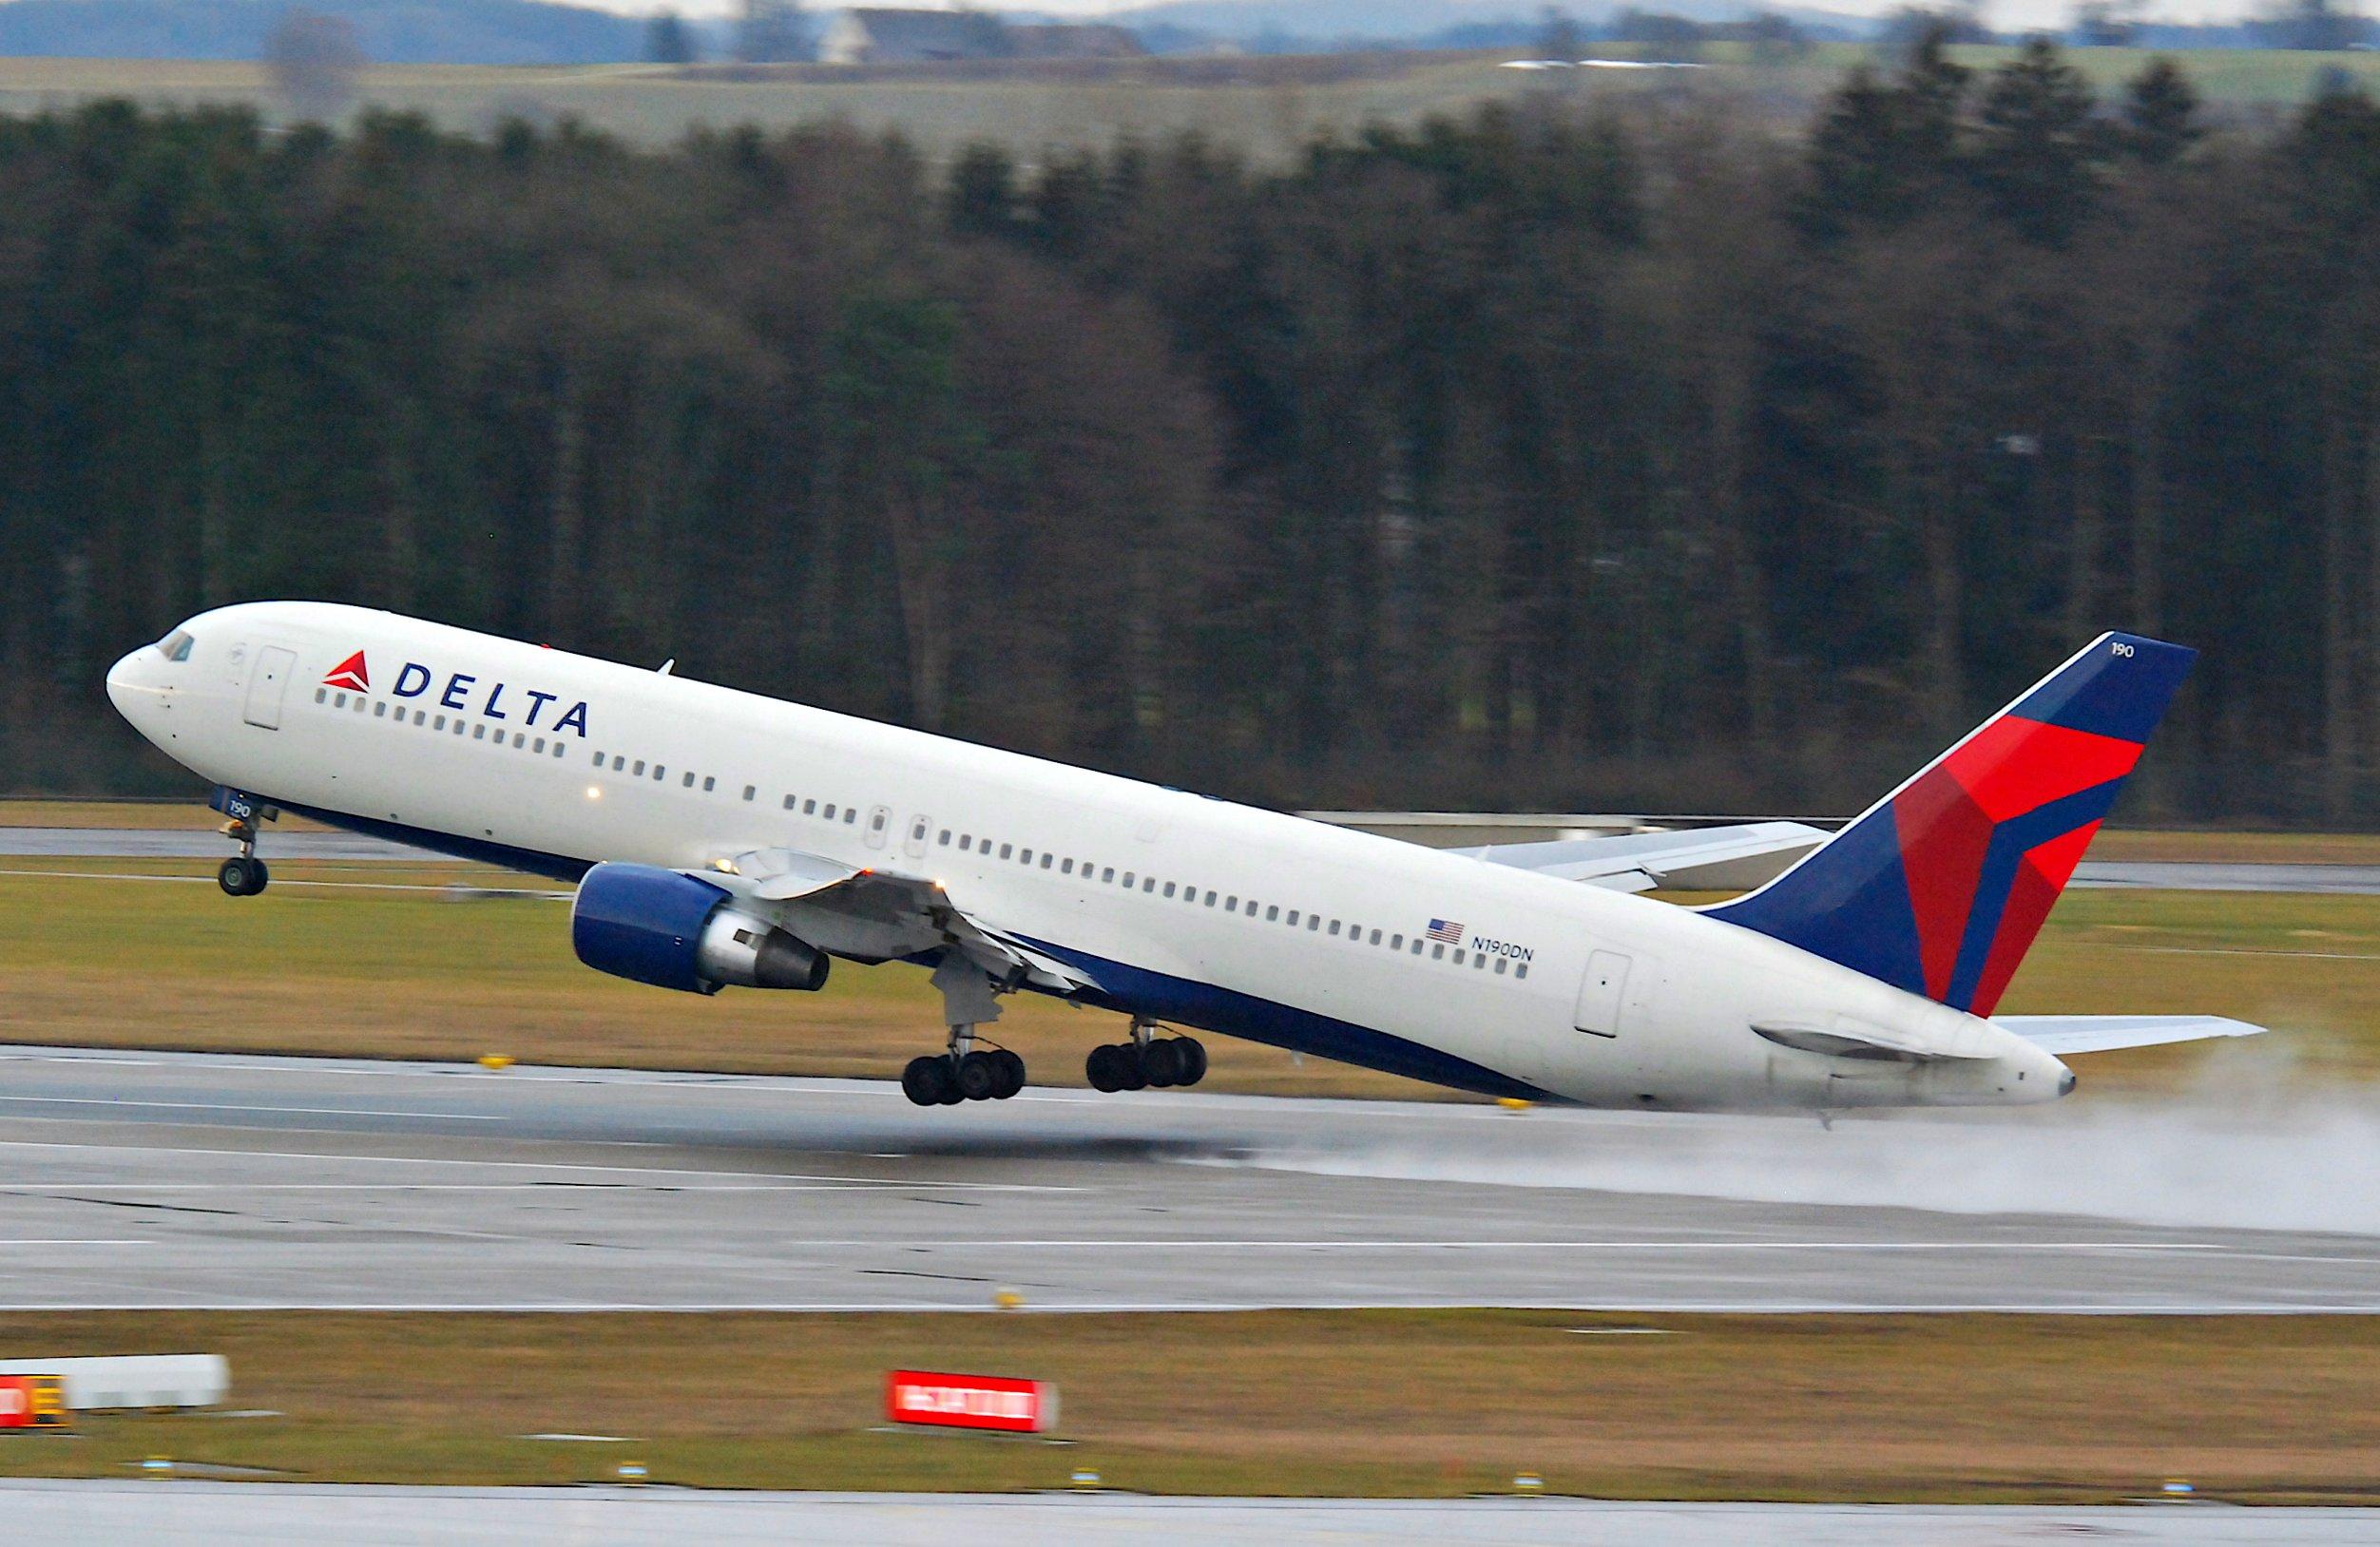 Delta_Air_Lines_Boeing_